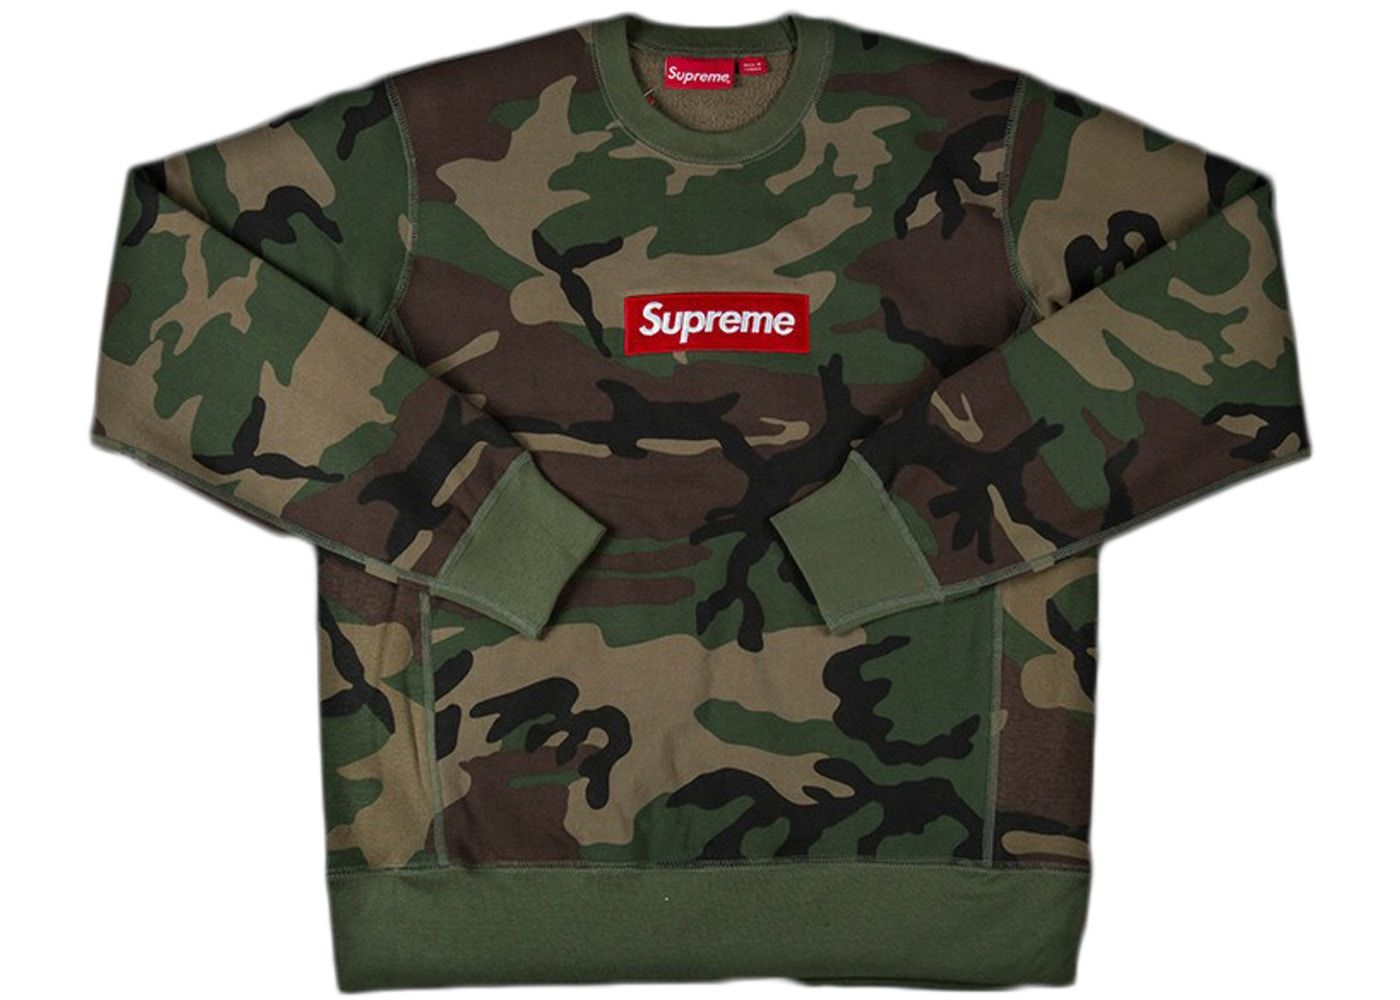 Supreme Box Logo Crewneck Fw15 Camo In 2021 Supreme Sweatshirt Boys Designer Clothes Supreme Box Logo [ 1000 x 1400 Pixel ]